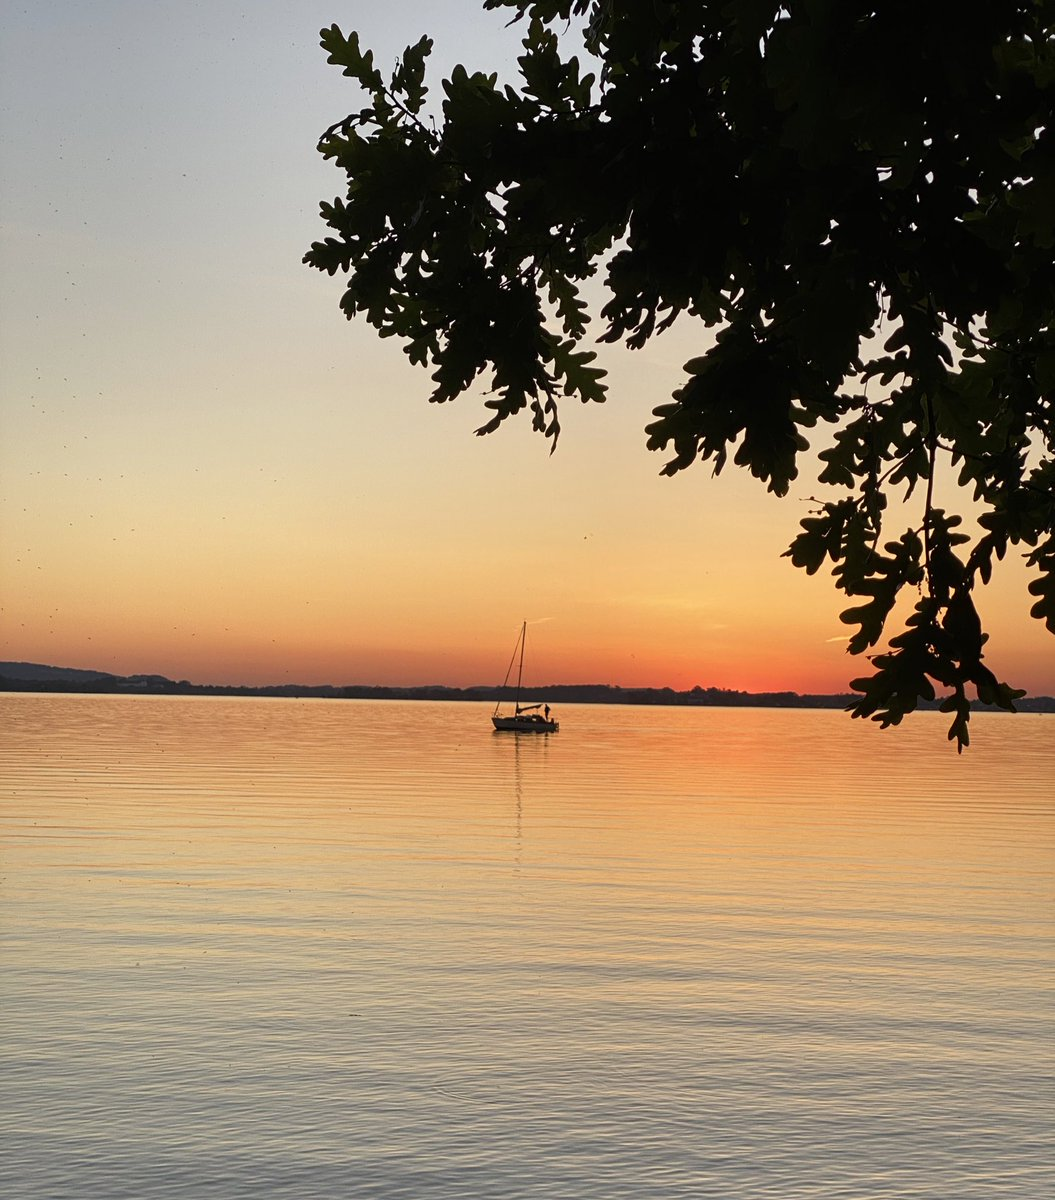 #sunset https://t.co/N33KaCMYMV